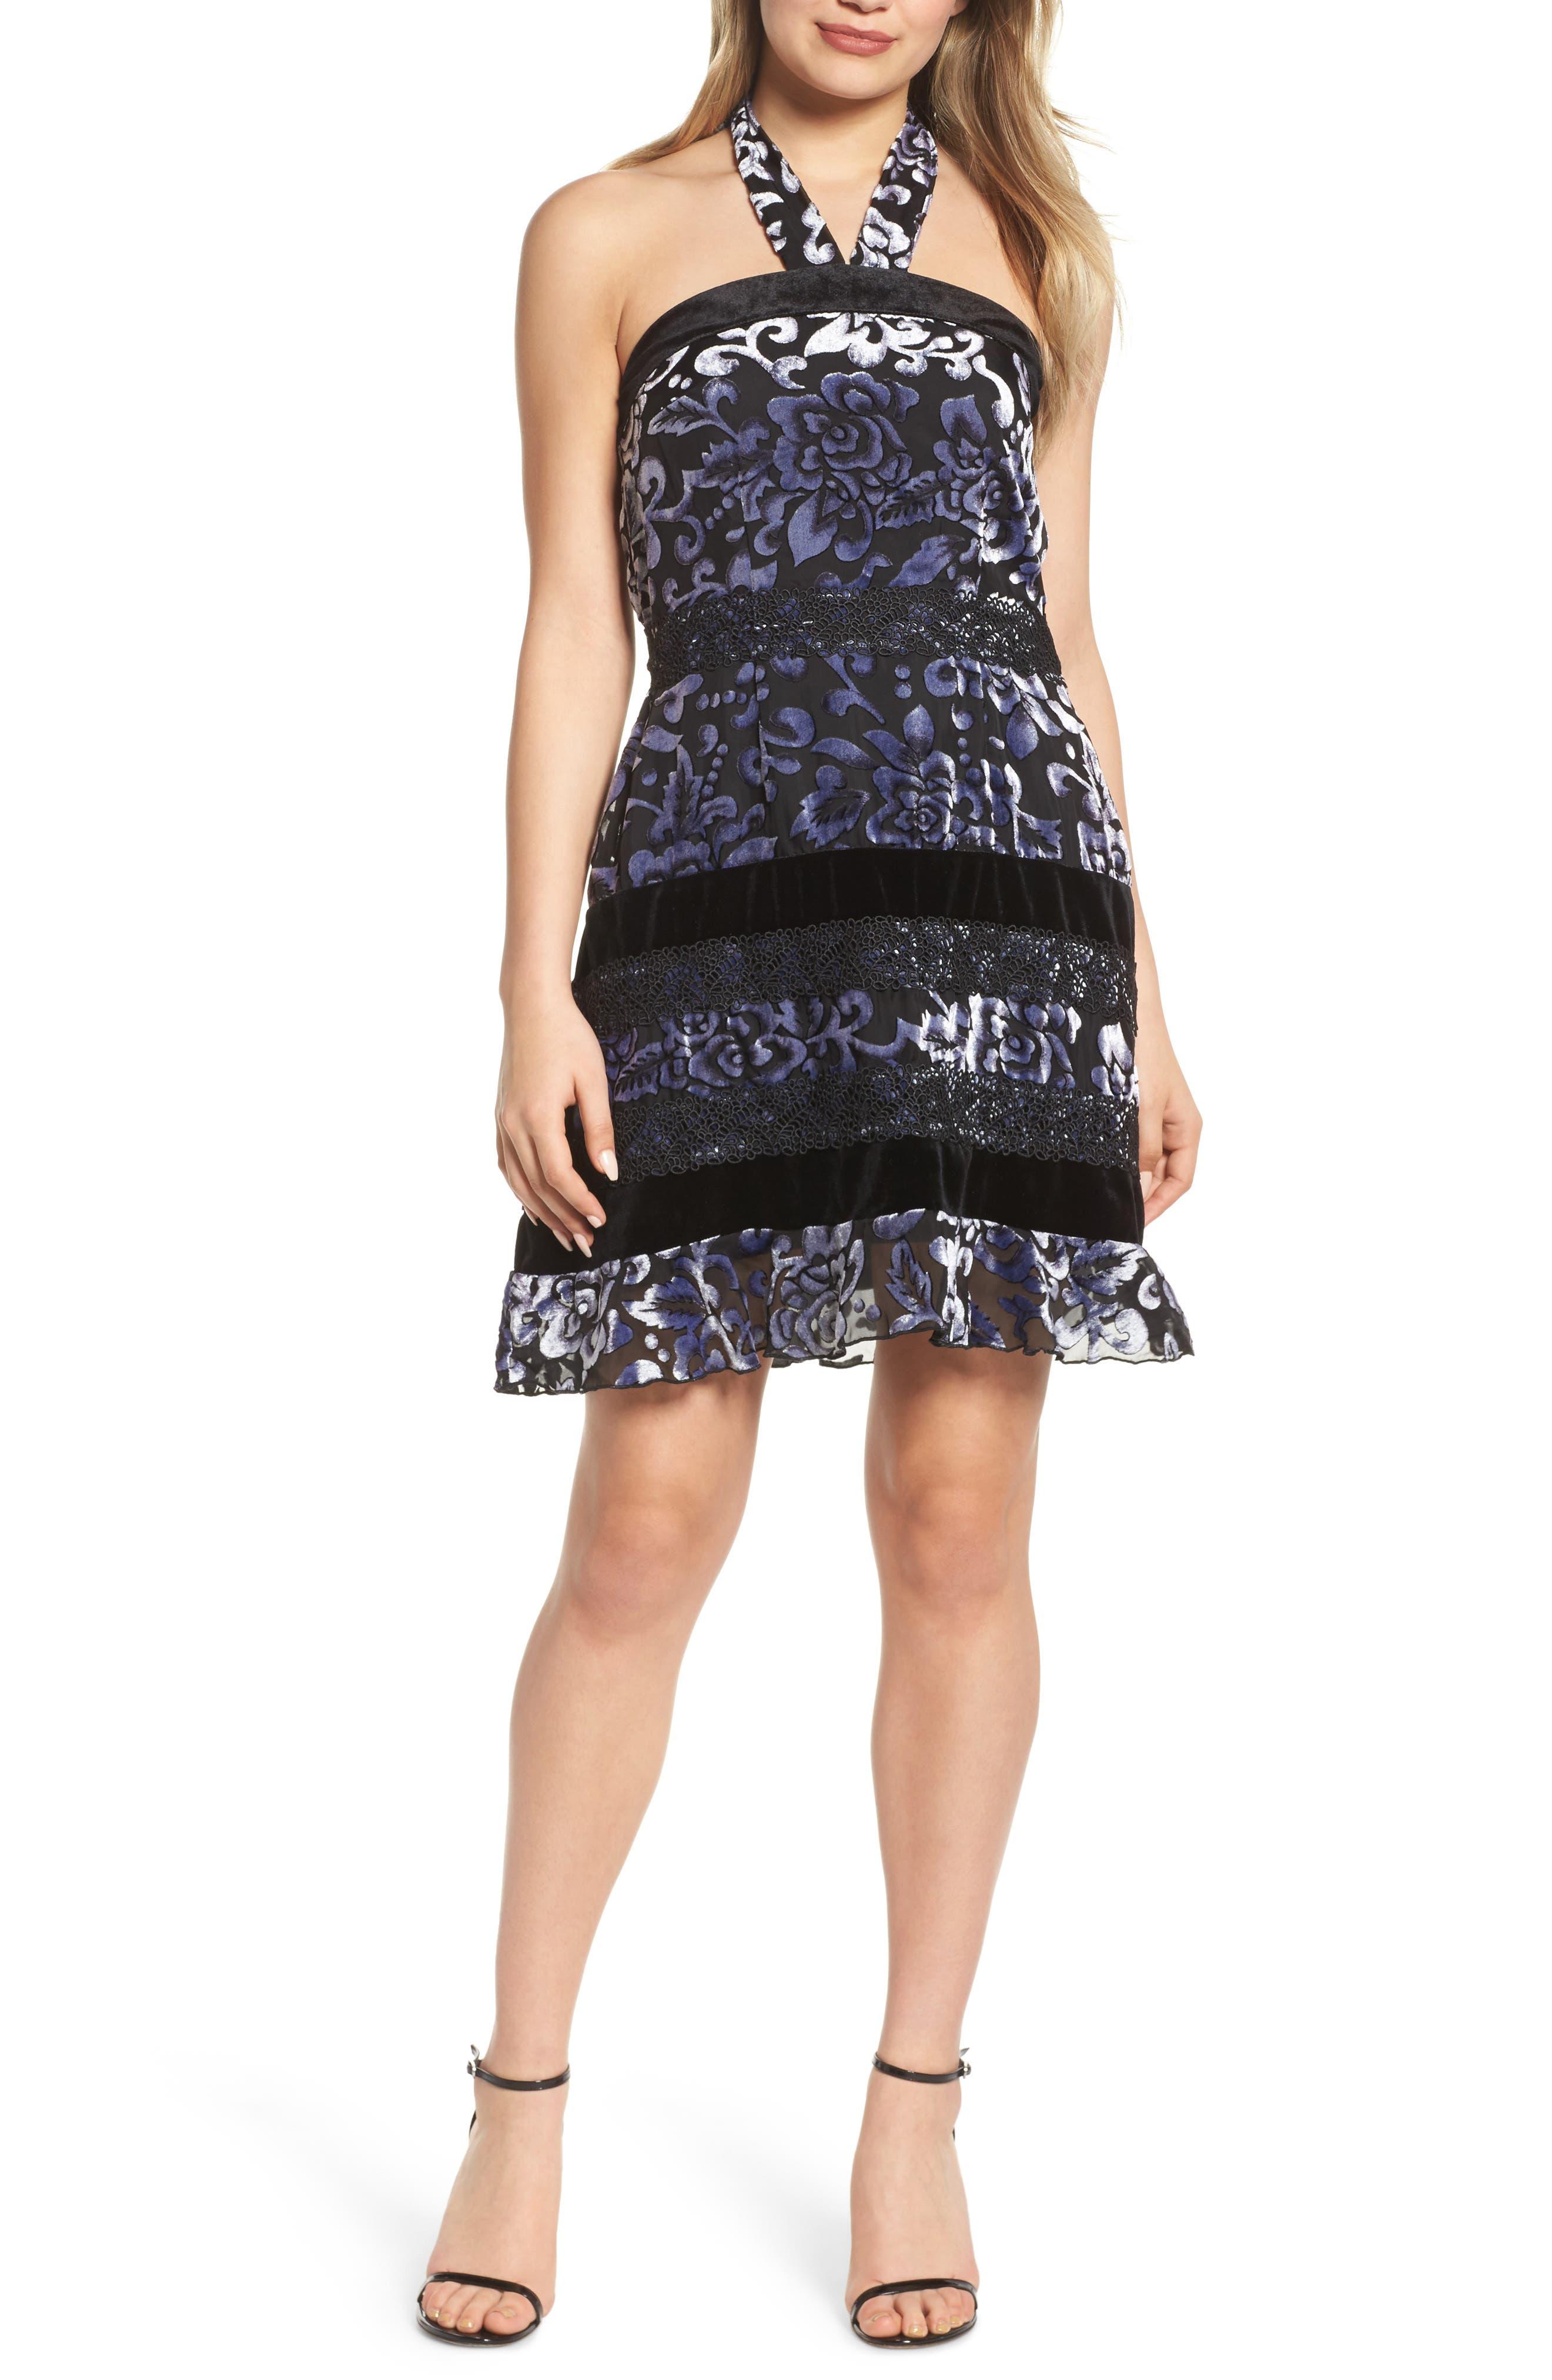 Alternate Image 1 Selected - Foxiedox Velvet Halter Neck Fit & Flare Dress